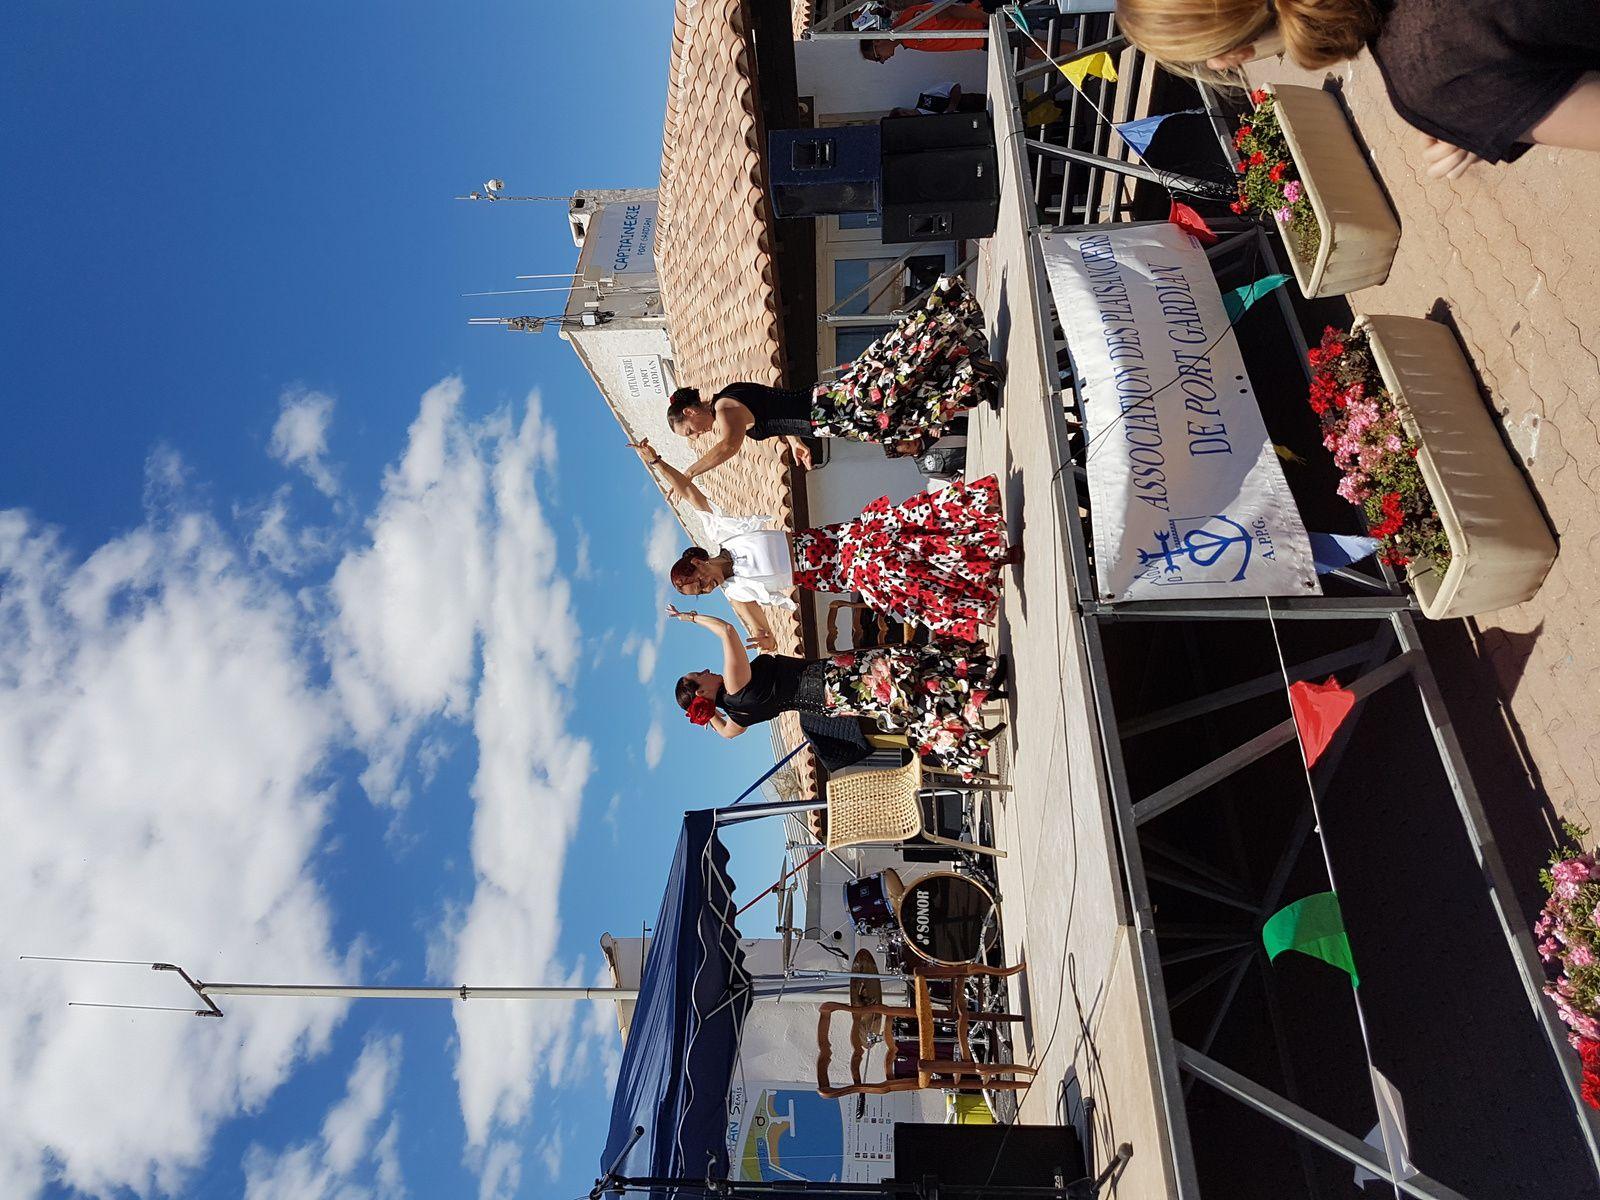 la fête à Port Gardian, Bandas, Pin-up, Flamenco ...